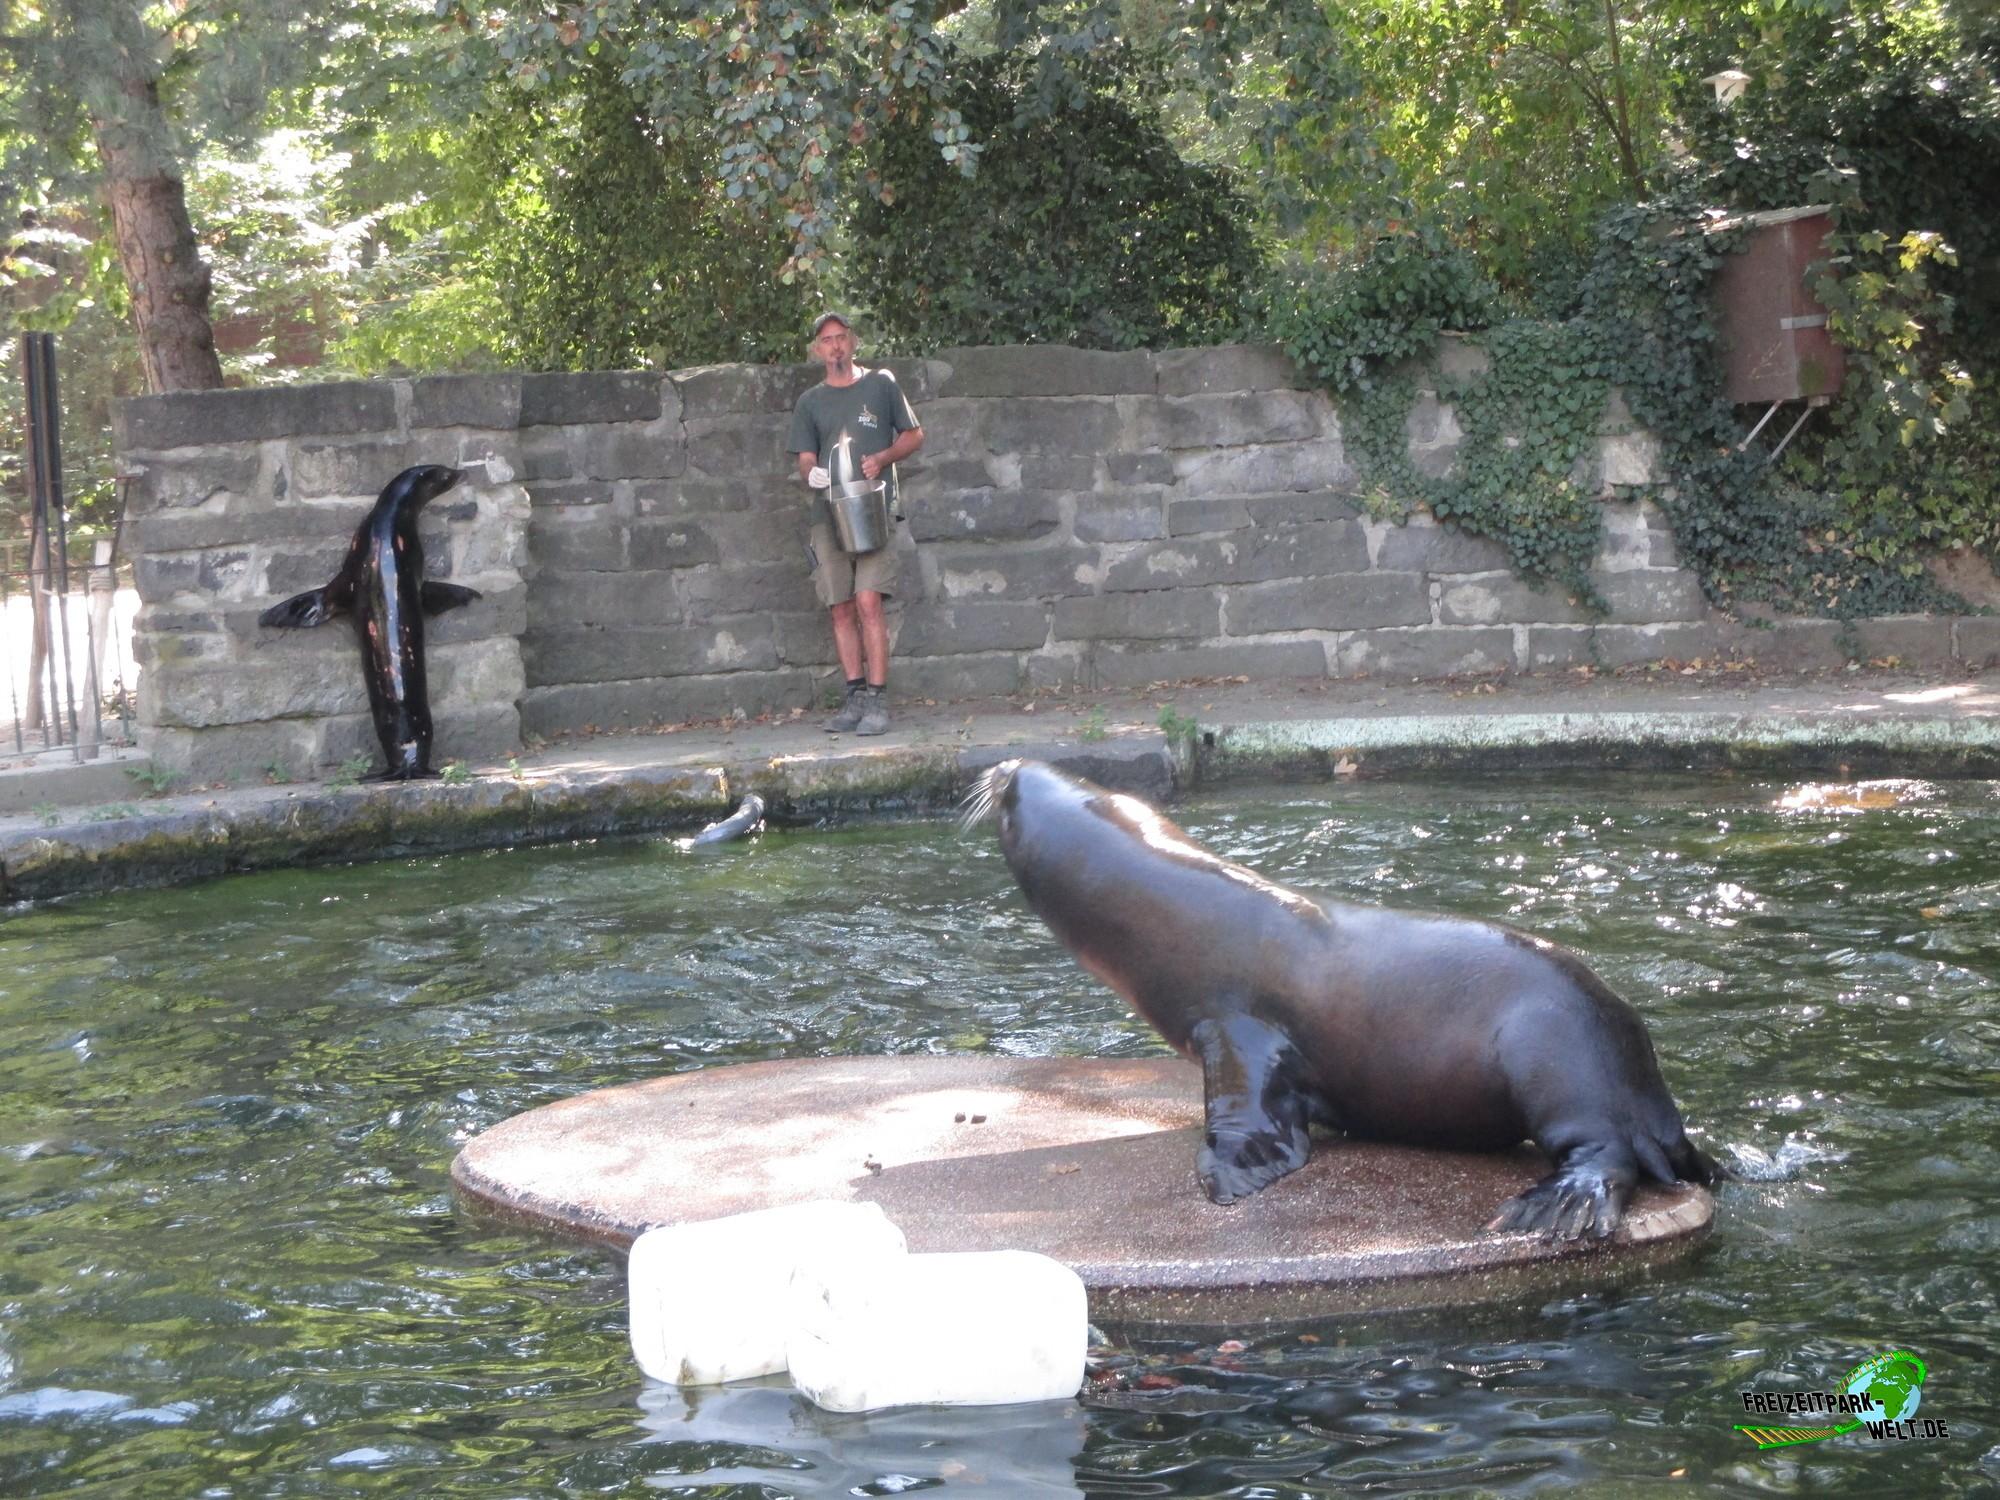 kalifornischer seel we zoo krefeld freizeitpark. Black Bedroom Furniture Sets. Home Design Ideas